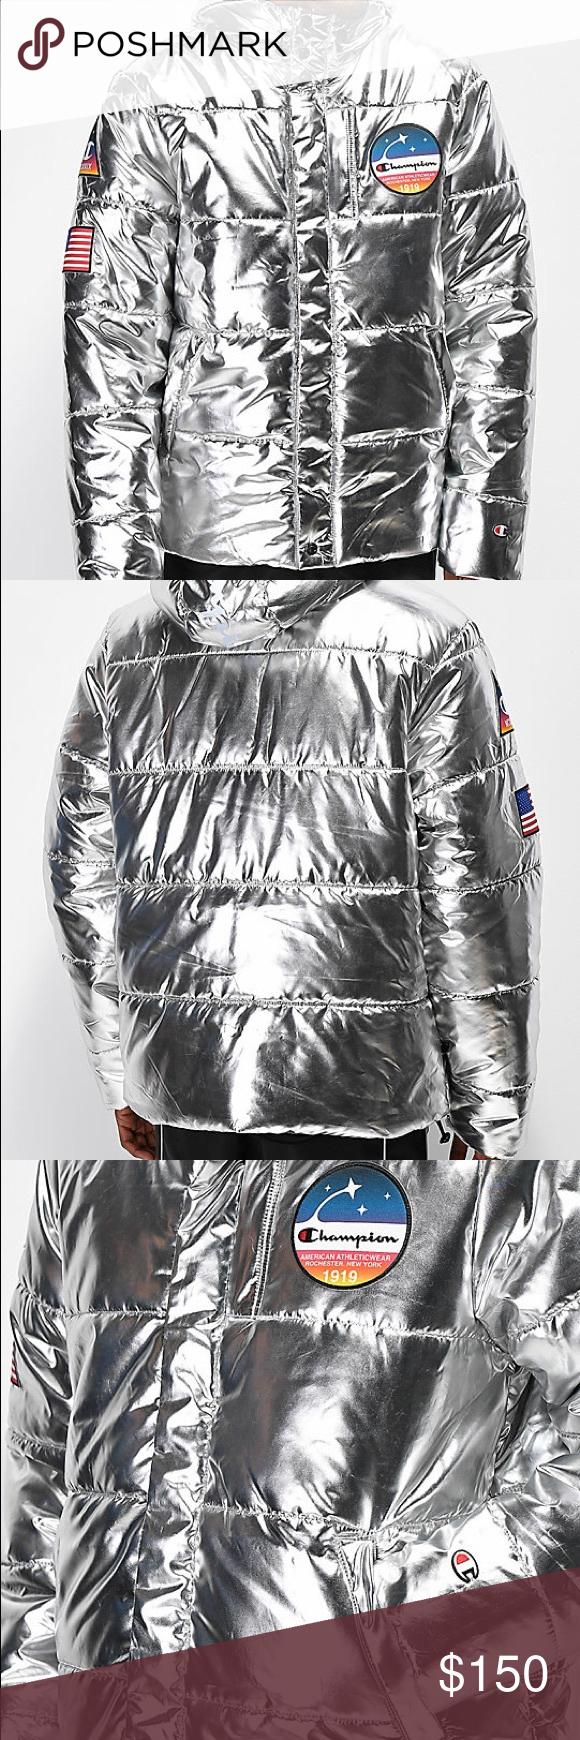 Champion Metallic Nasa Jacket L Nasa Jacket Nasa Clothes Jackets [ 1740 x 580 Pixel ]